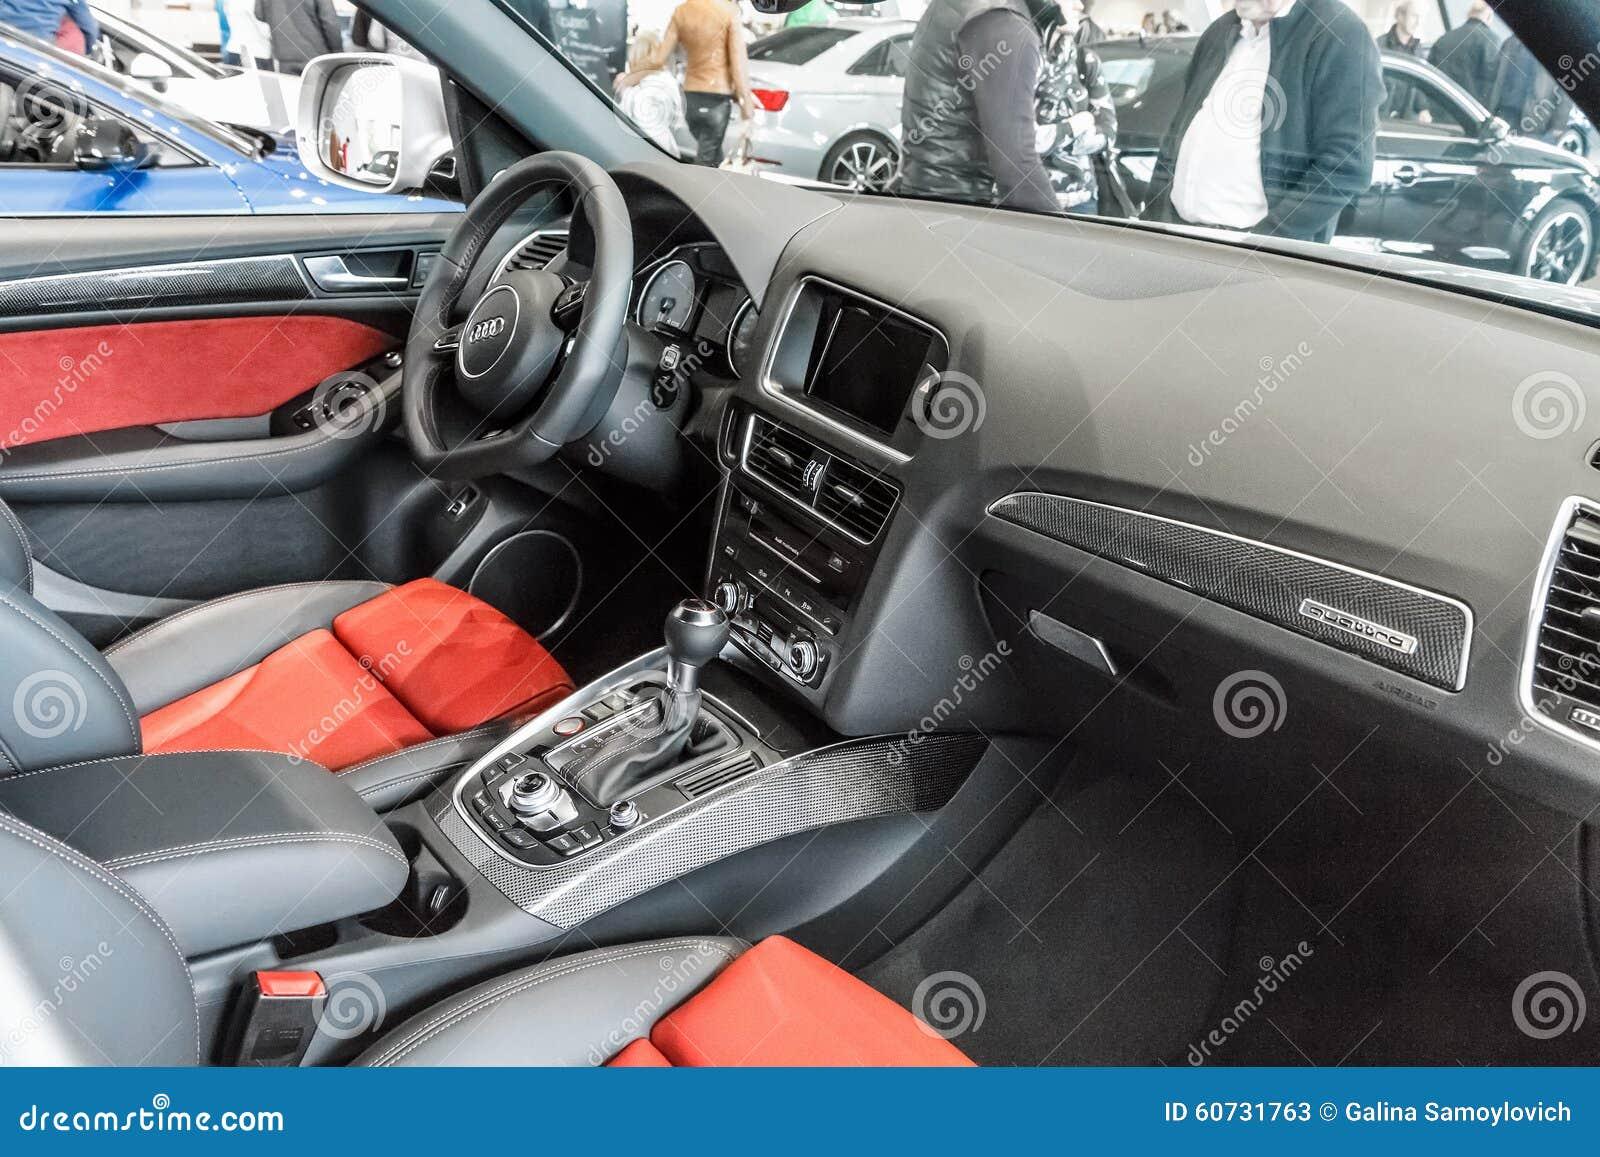 Interior Audi A5 Cabriolet Editorial Stock Photo Image Of Design 60731763